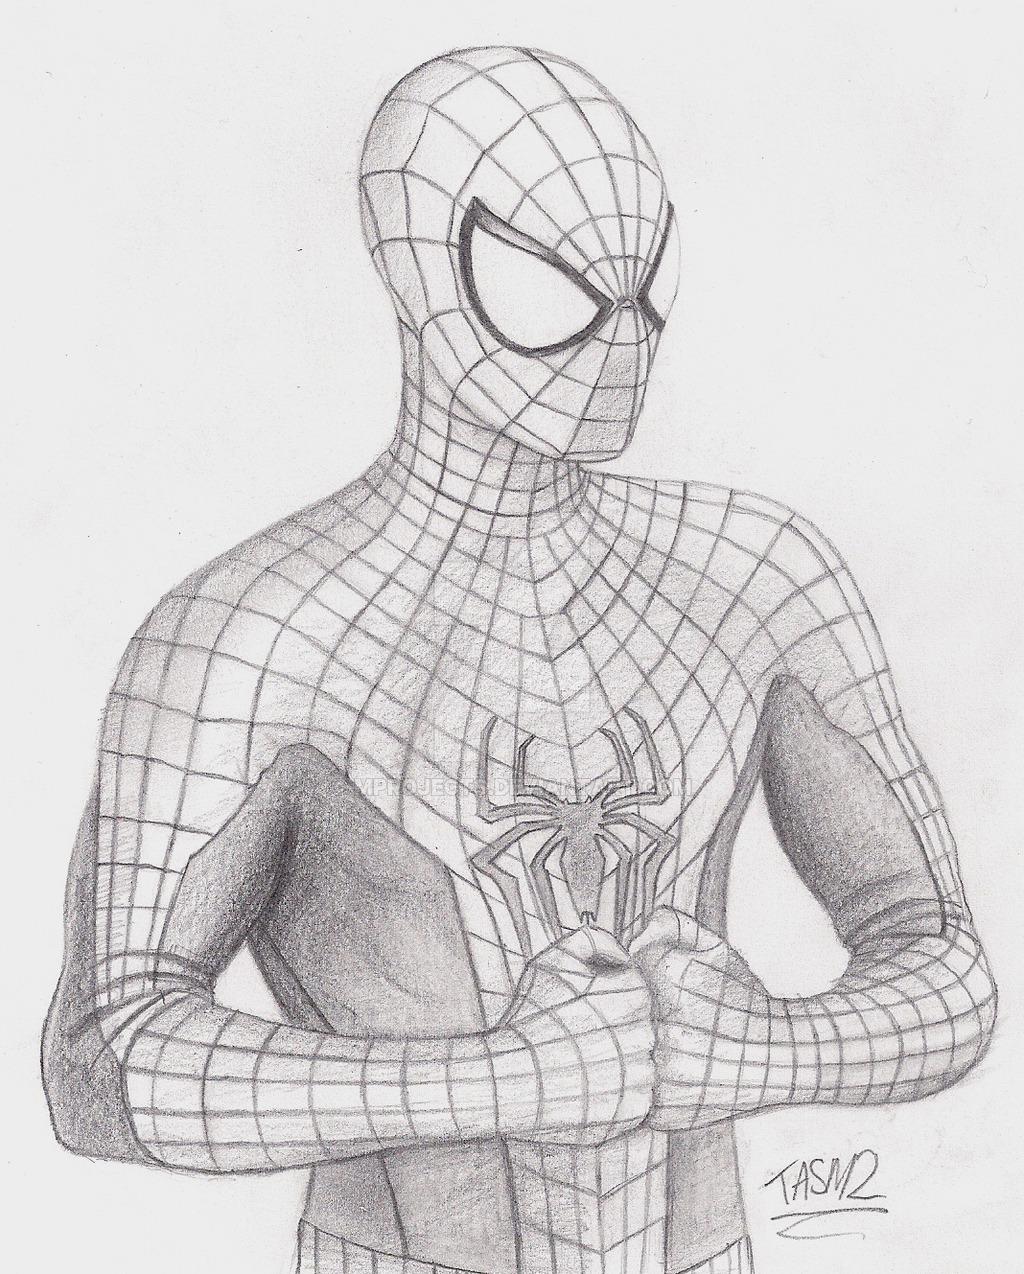 Drawn spider-man sketch Amazing Spider photo#23 costume The